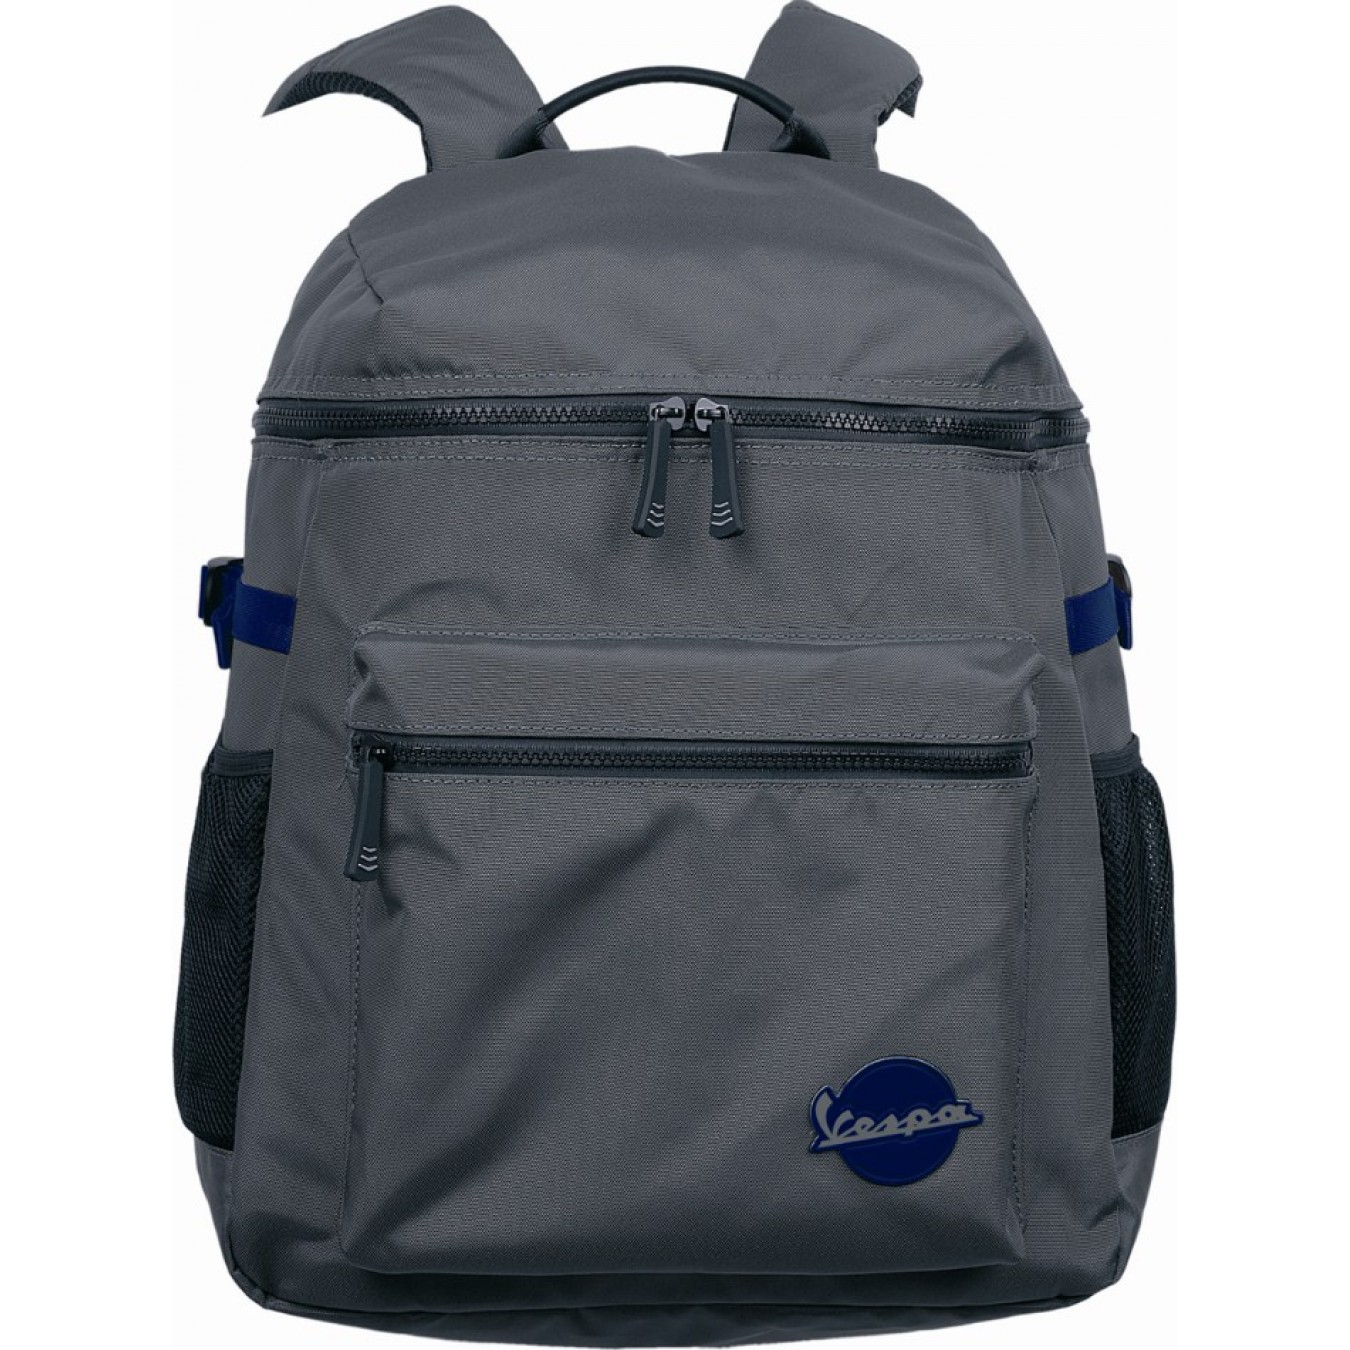 5a5a313224 Vespa Τσάντα Holiday FW18 Backpack Γκρι Τσάντες   Σακίδια   Βαλίτσες